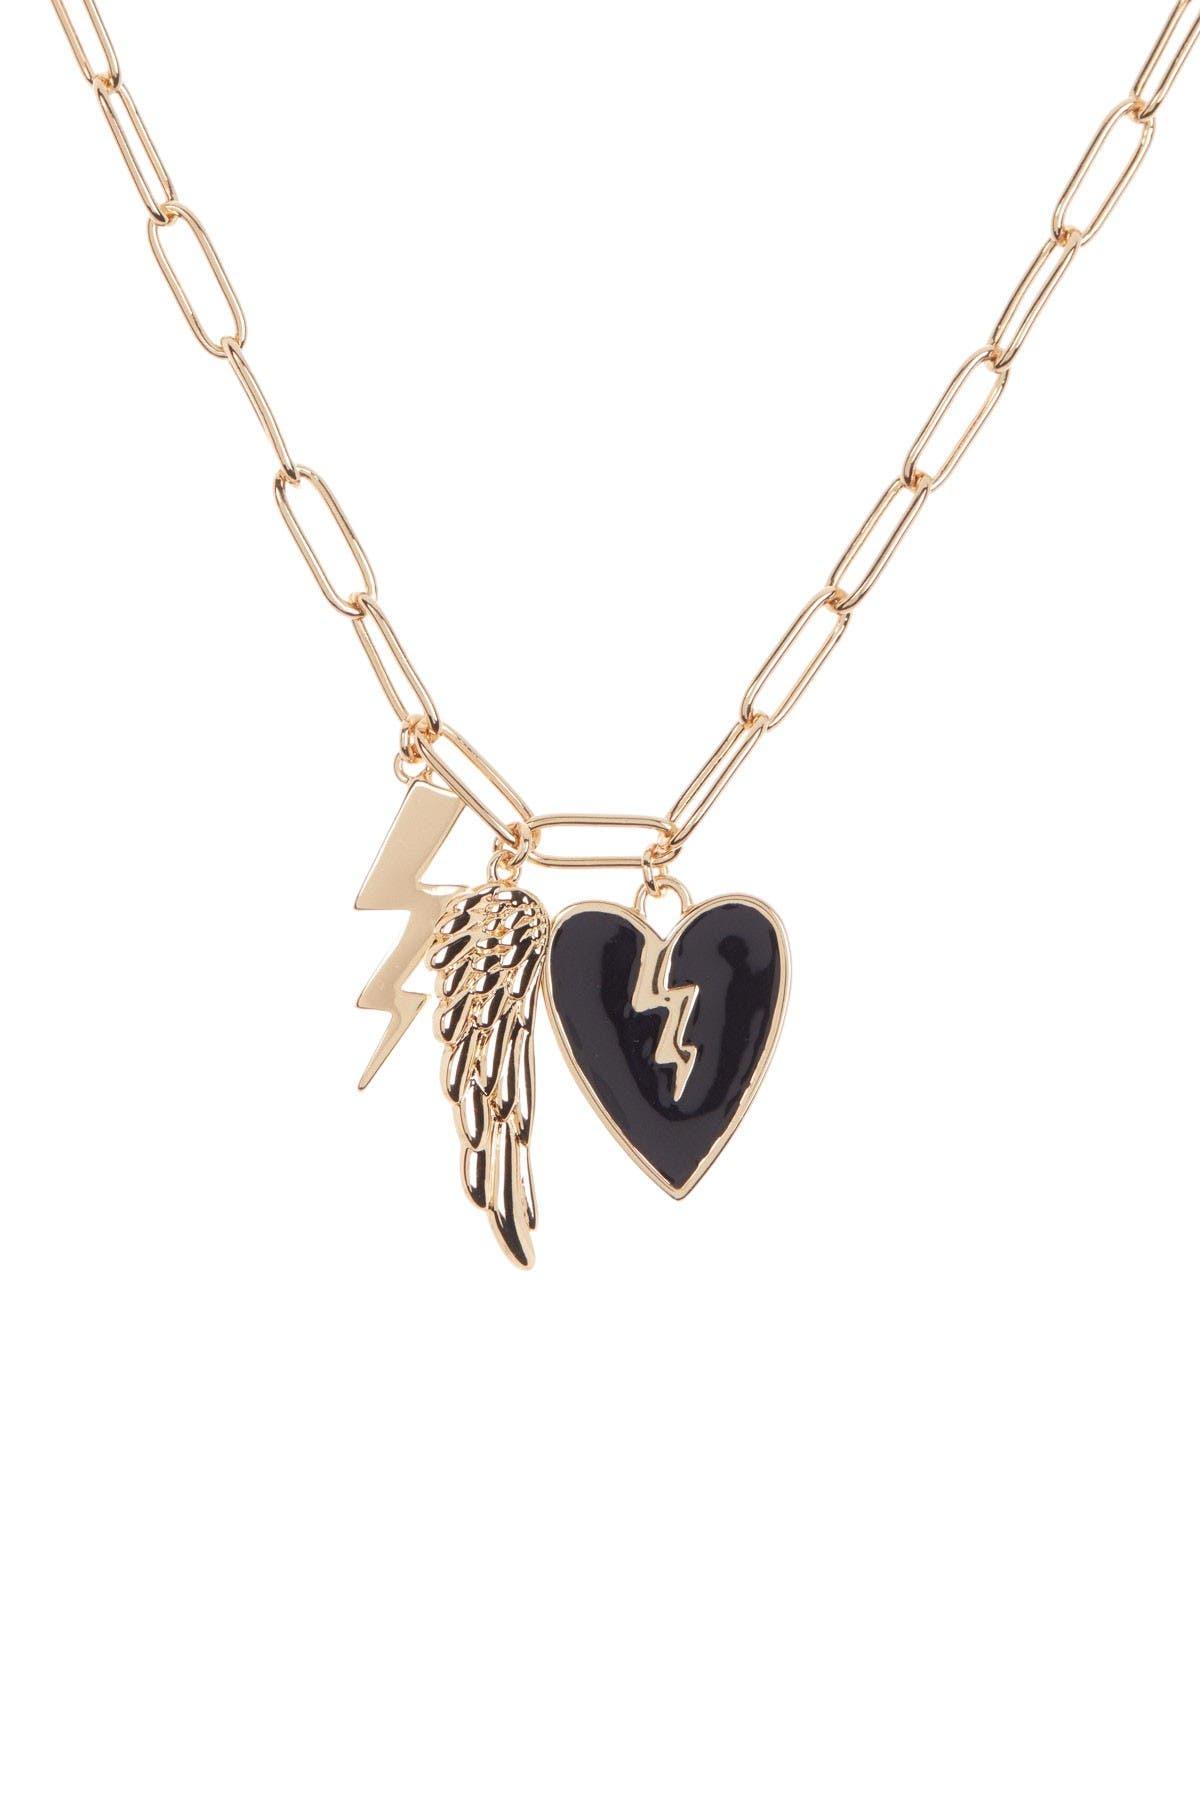 Image of Rebecca Minkoff Rocker Charm Cluster Pendant Necklace